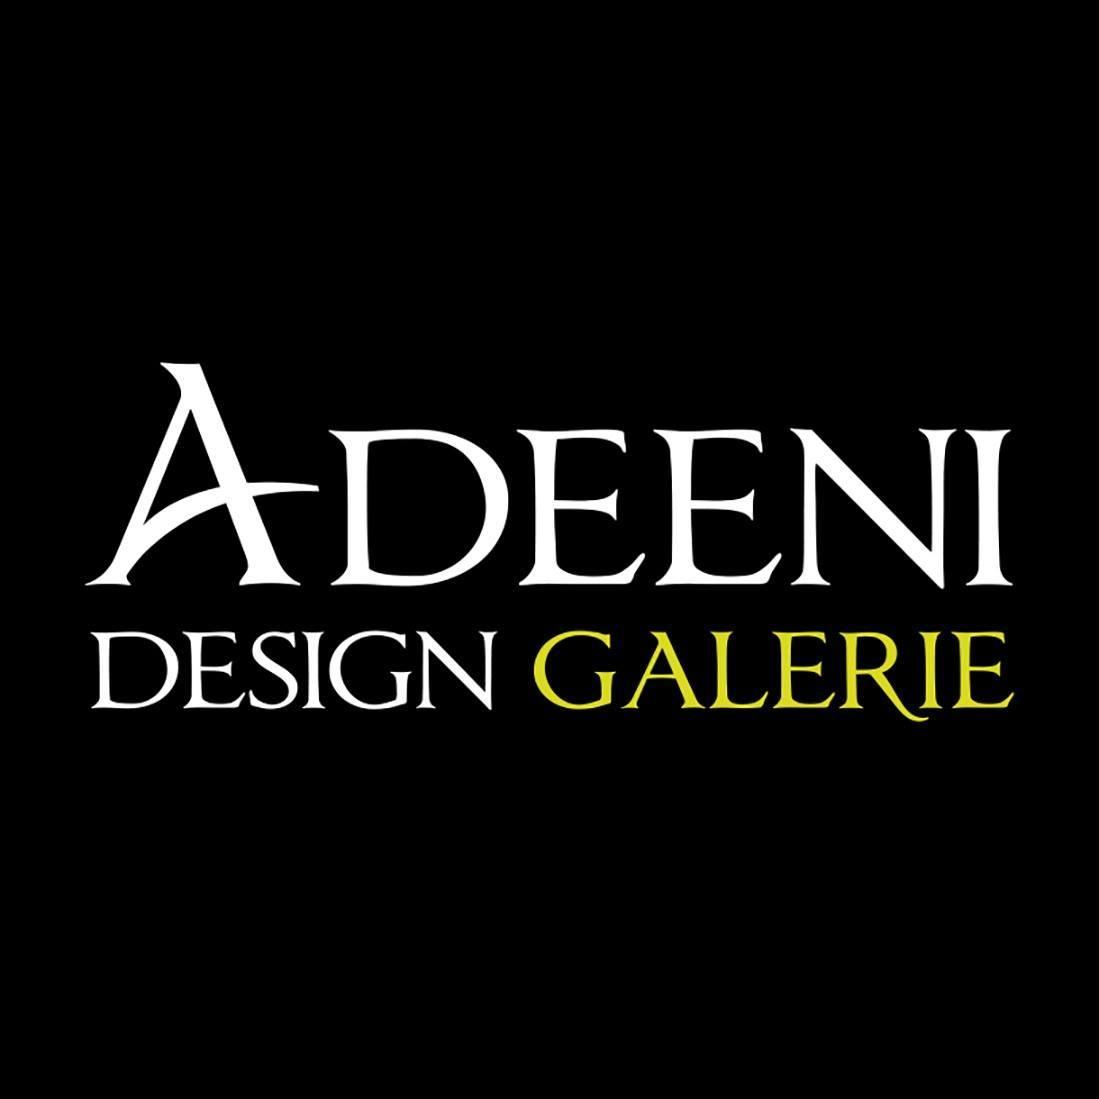 Adeeni Design Group & Adeeni Design Galerie